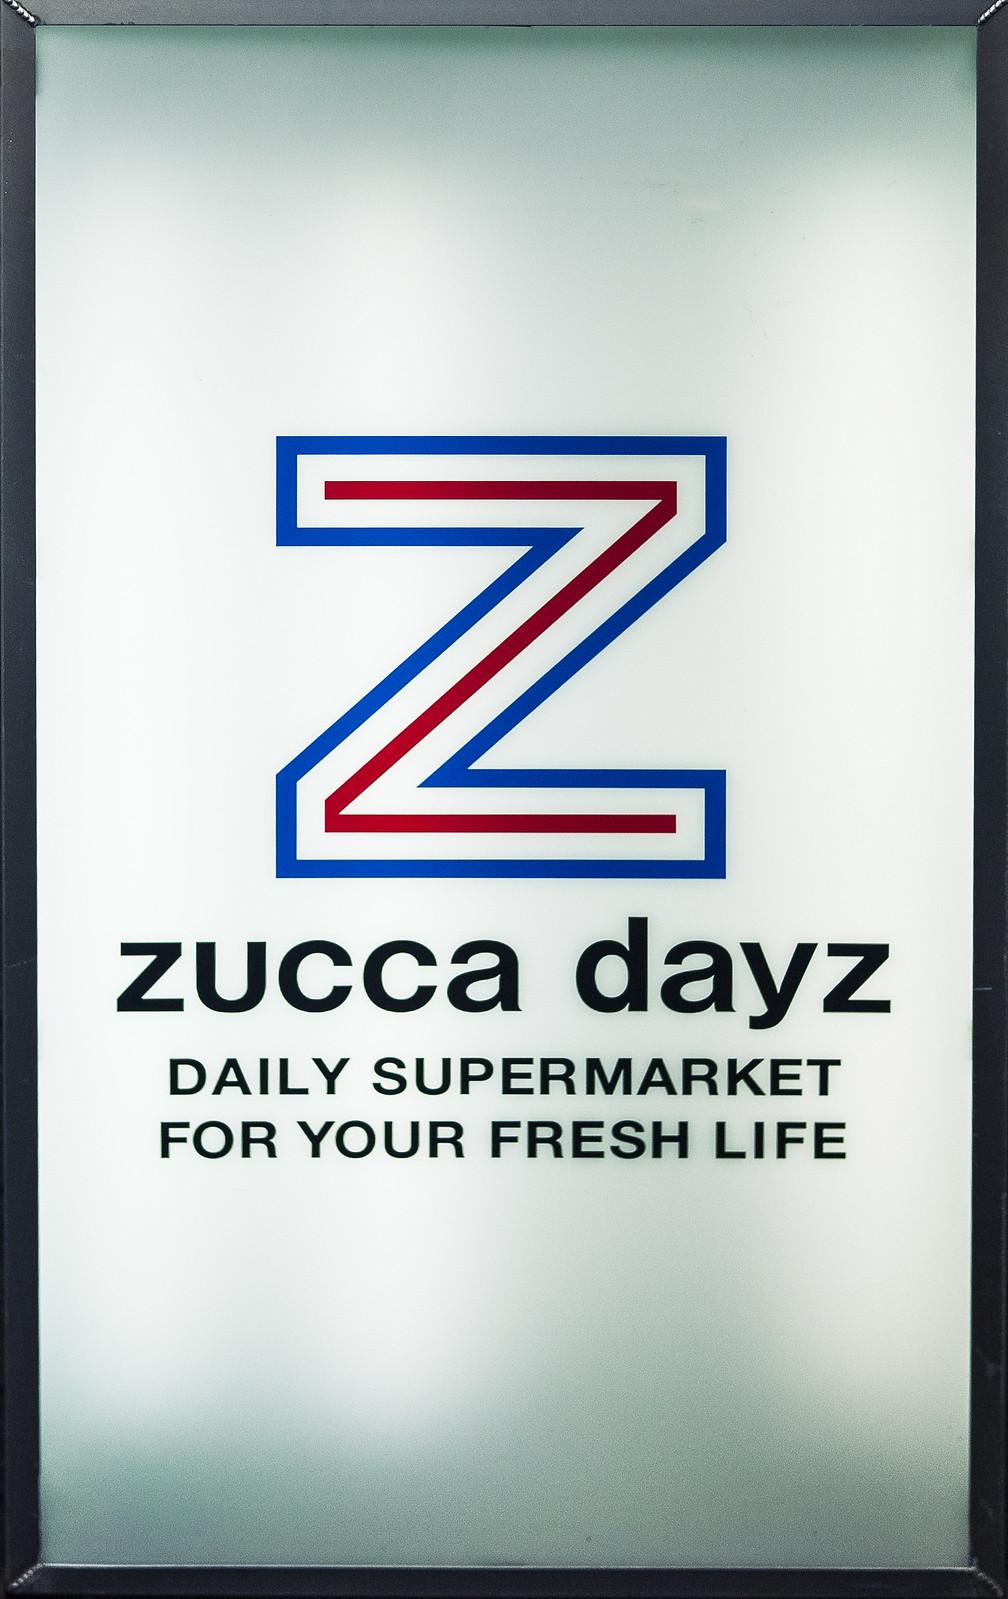 zucca dayz